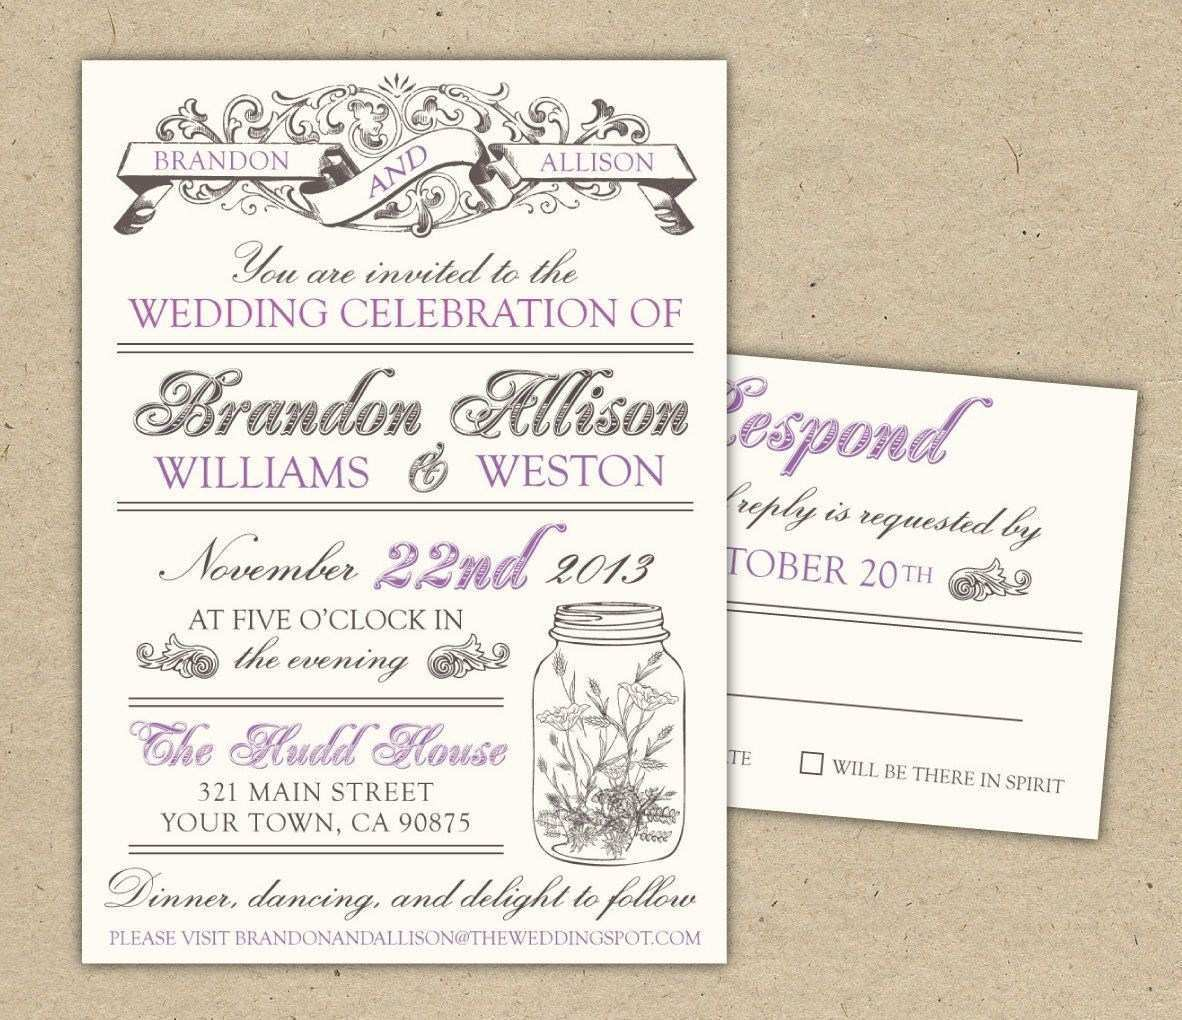 16 Adding Wedding Invitation Template Download And Print PSD File with Wedding Invitation Template Download And Print